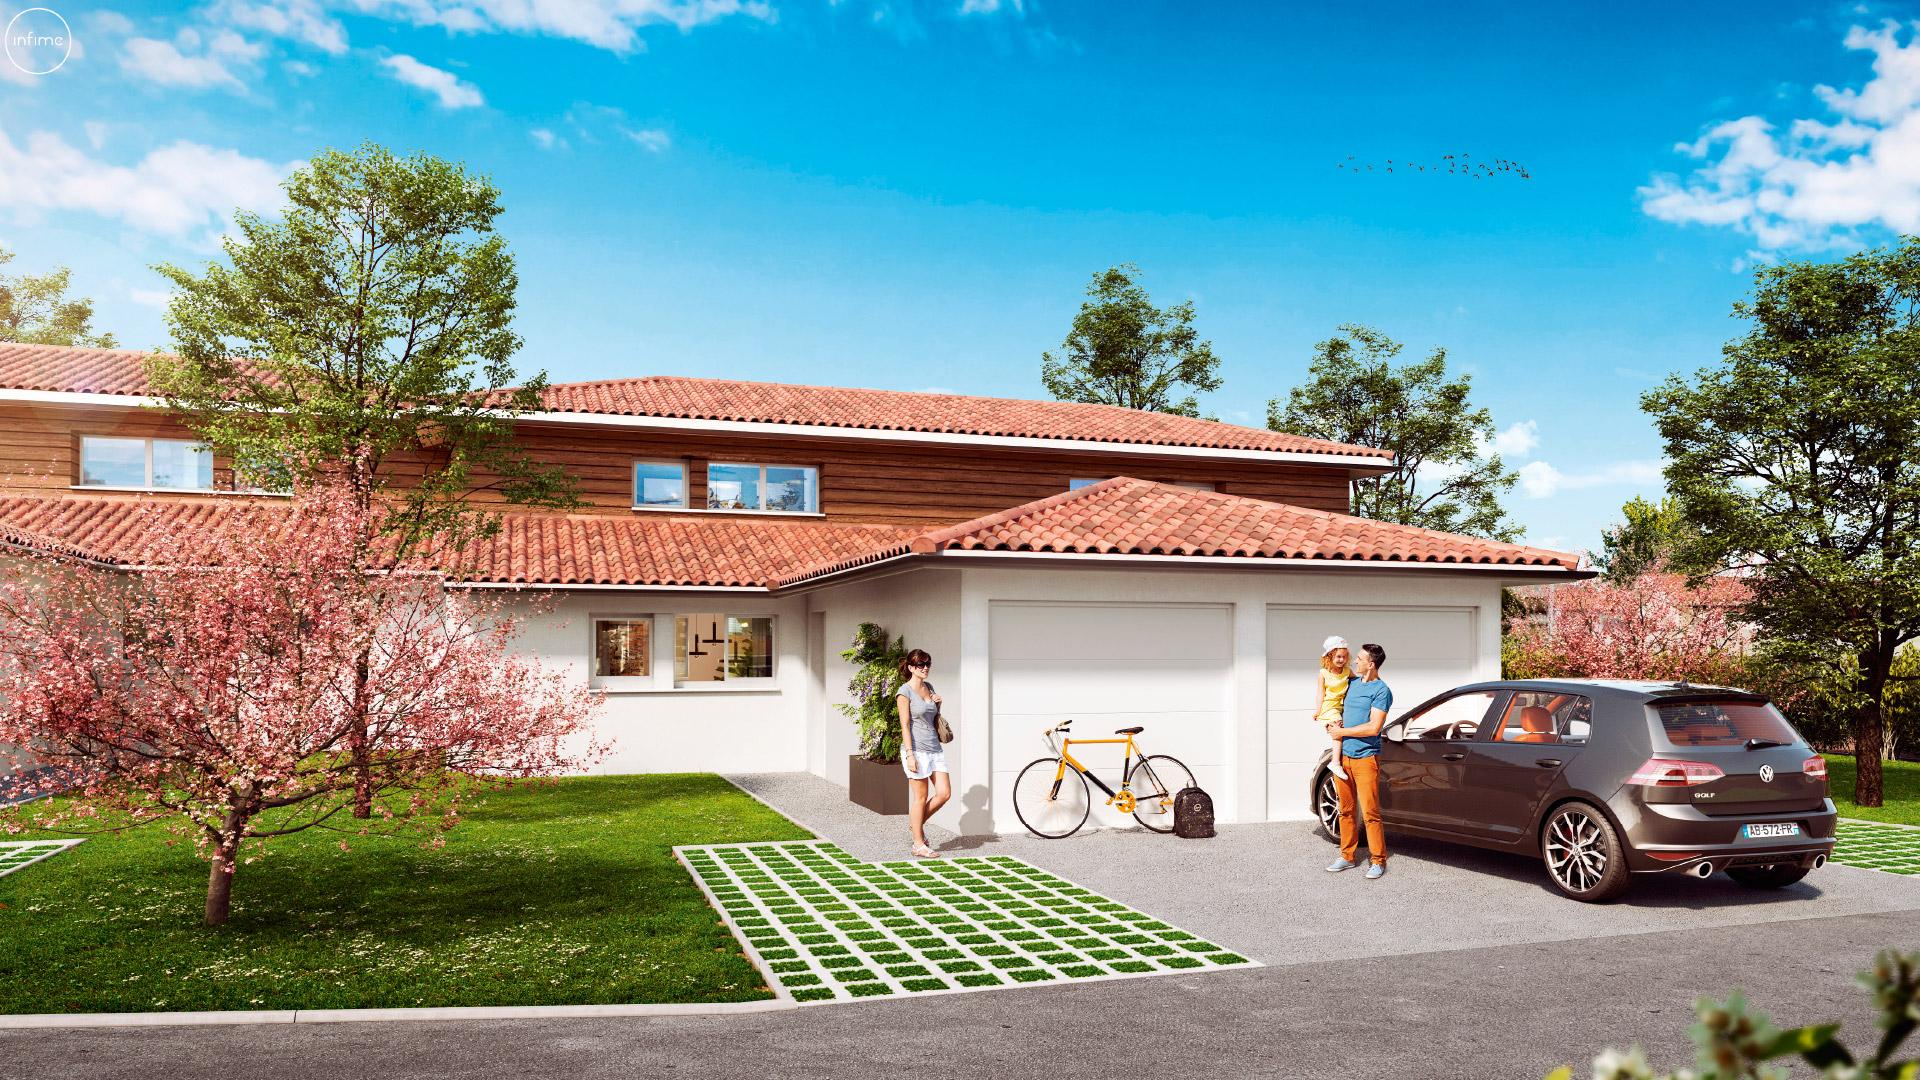 ENCANTADA - Maison Individuelle Dax - SAGIM Immobilier